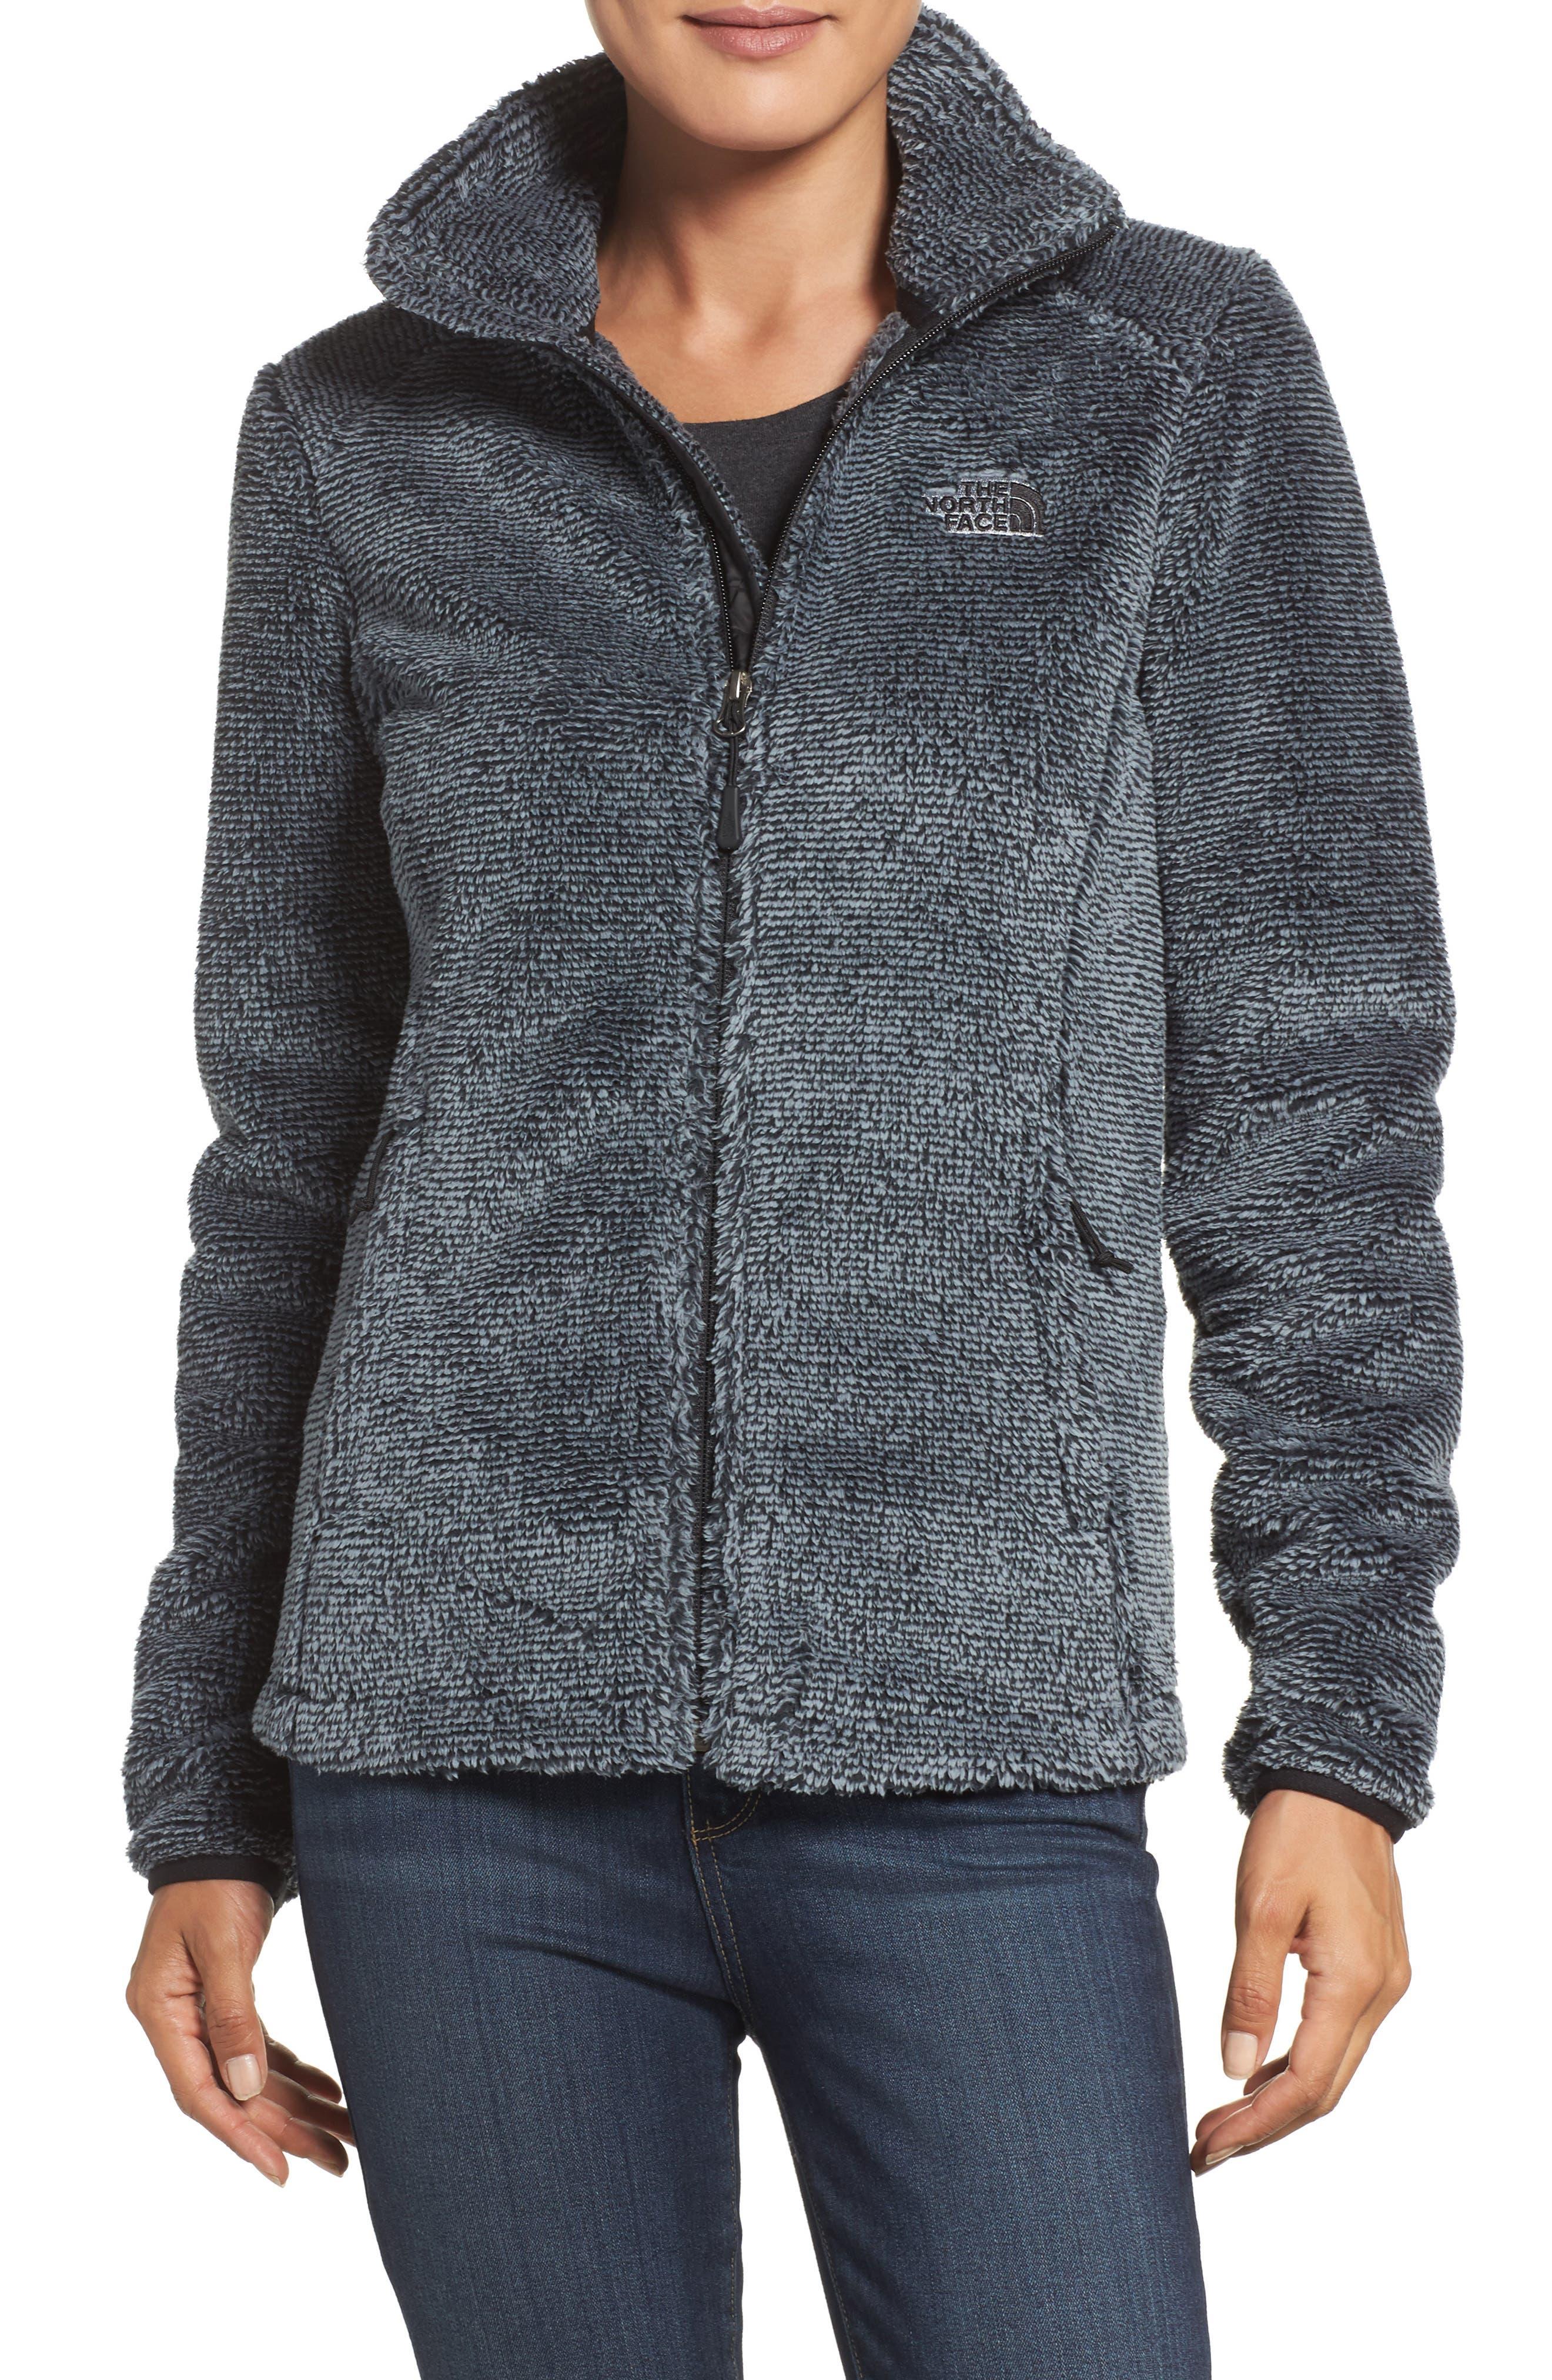 'Osito 2' Jacket,                         Main,                         color, Tnf Black/ Mid Grey Stripe